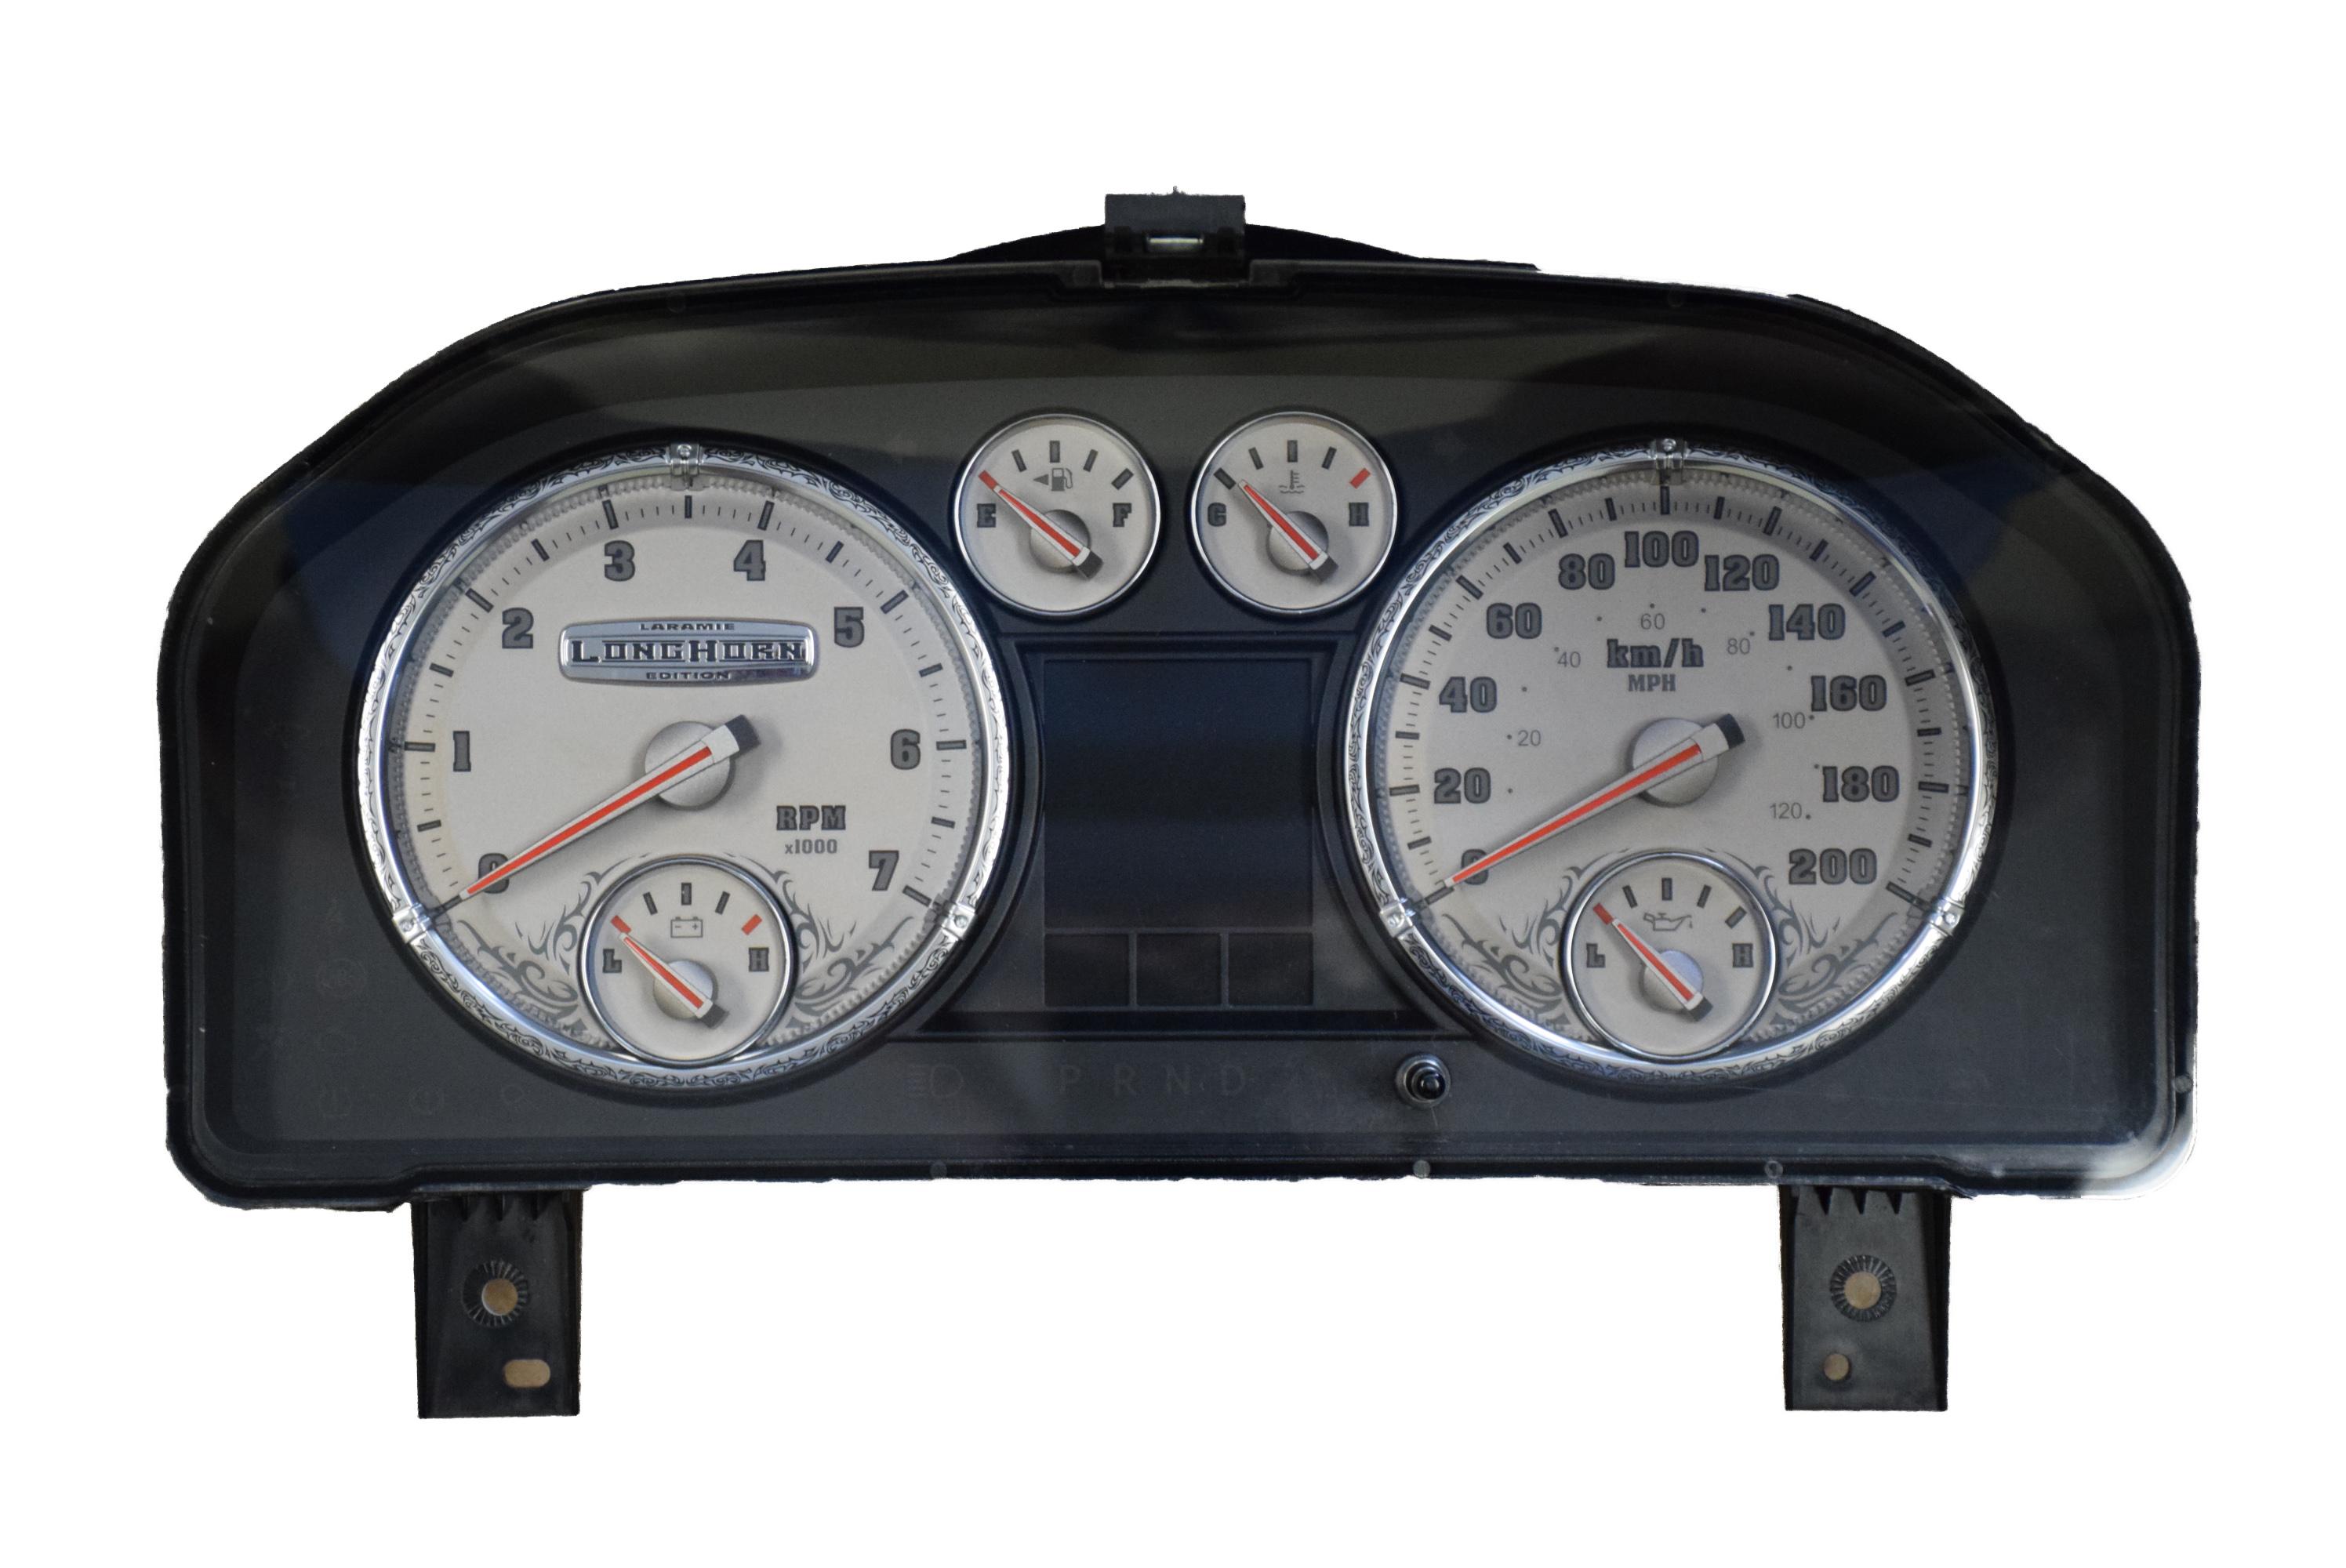 2011 DODGE RAM LARAMIE LONGHORN USED DASHBOARD INSTRUMENT CLUSTER FOR SALE  (KM/H)